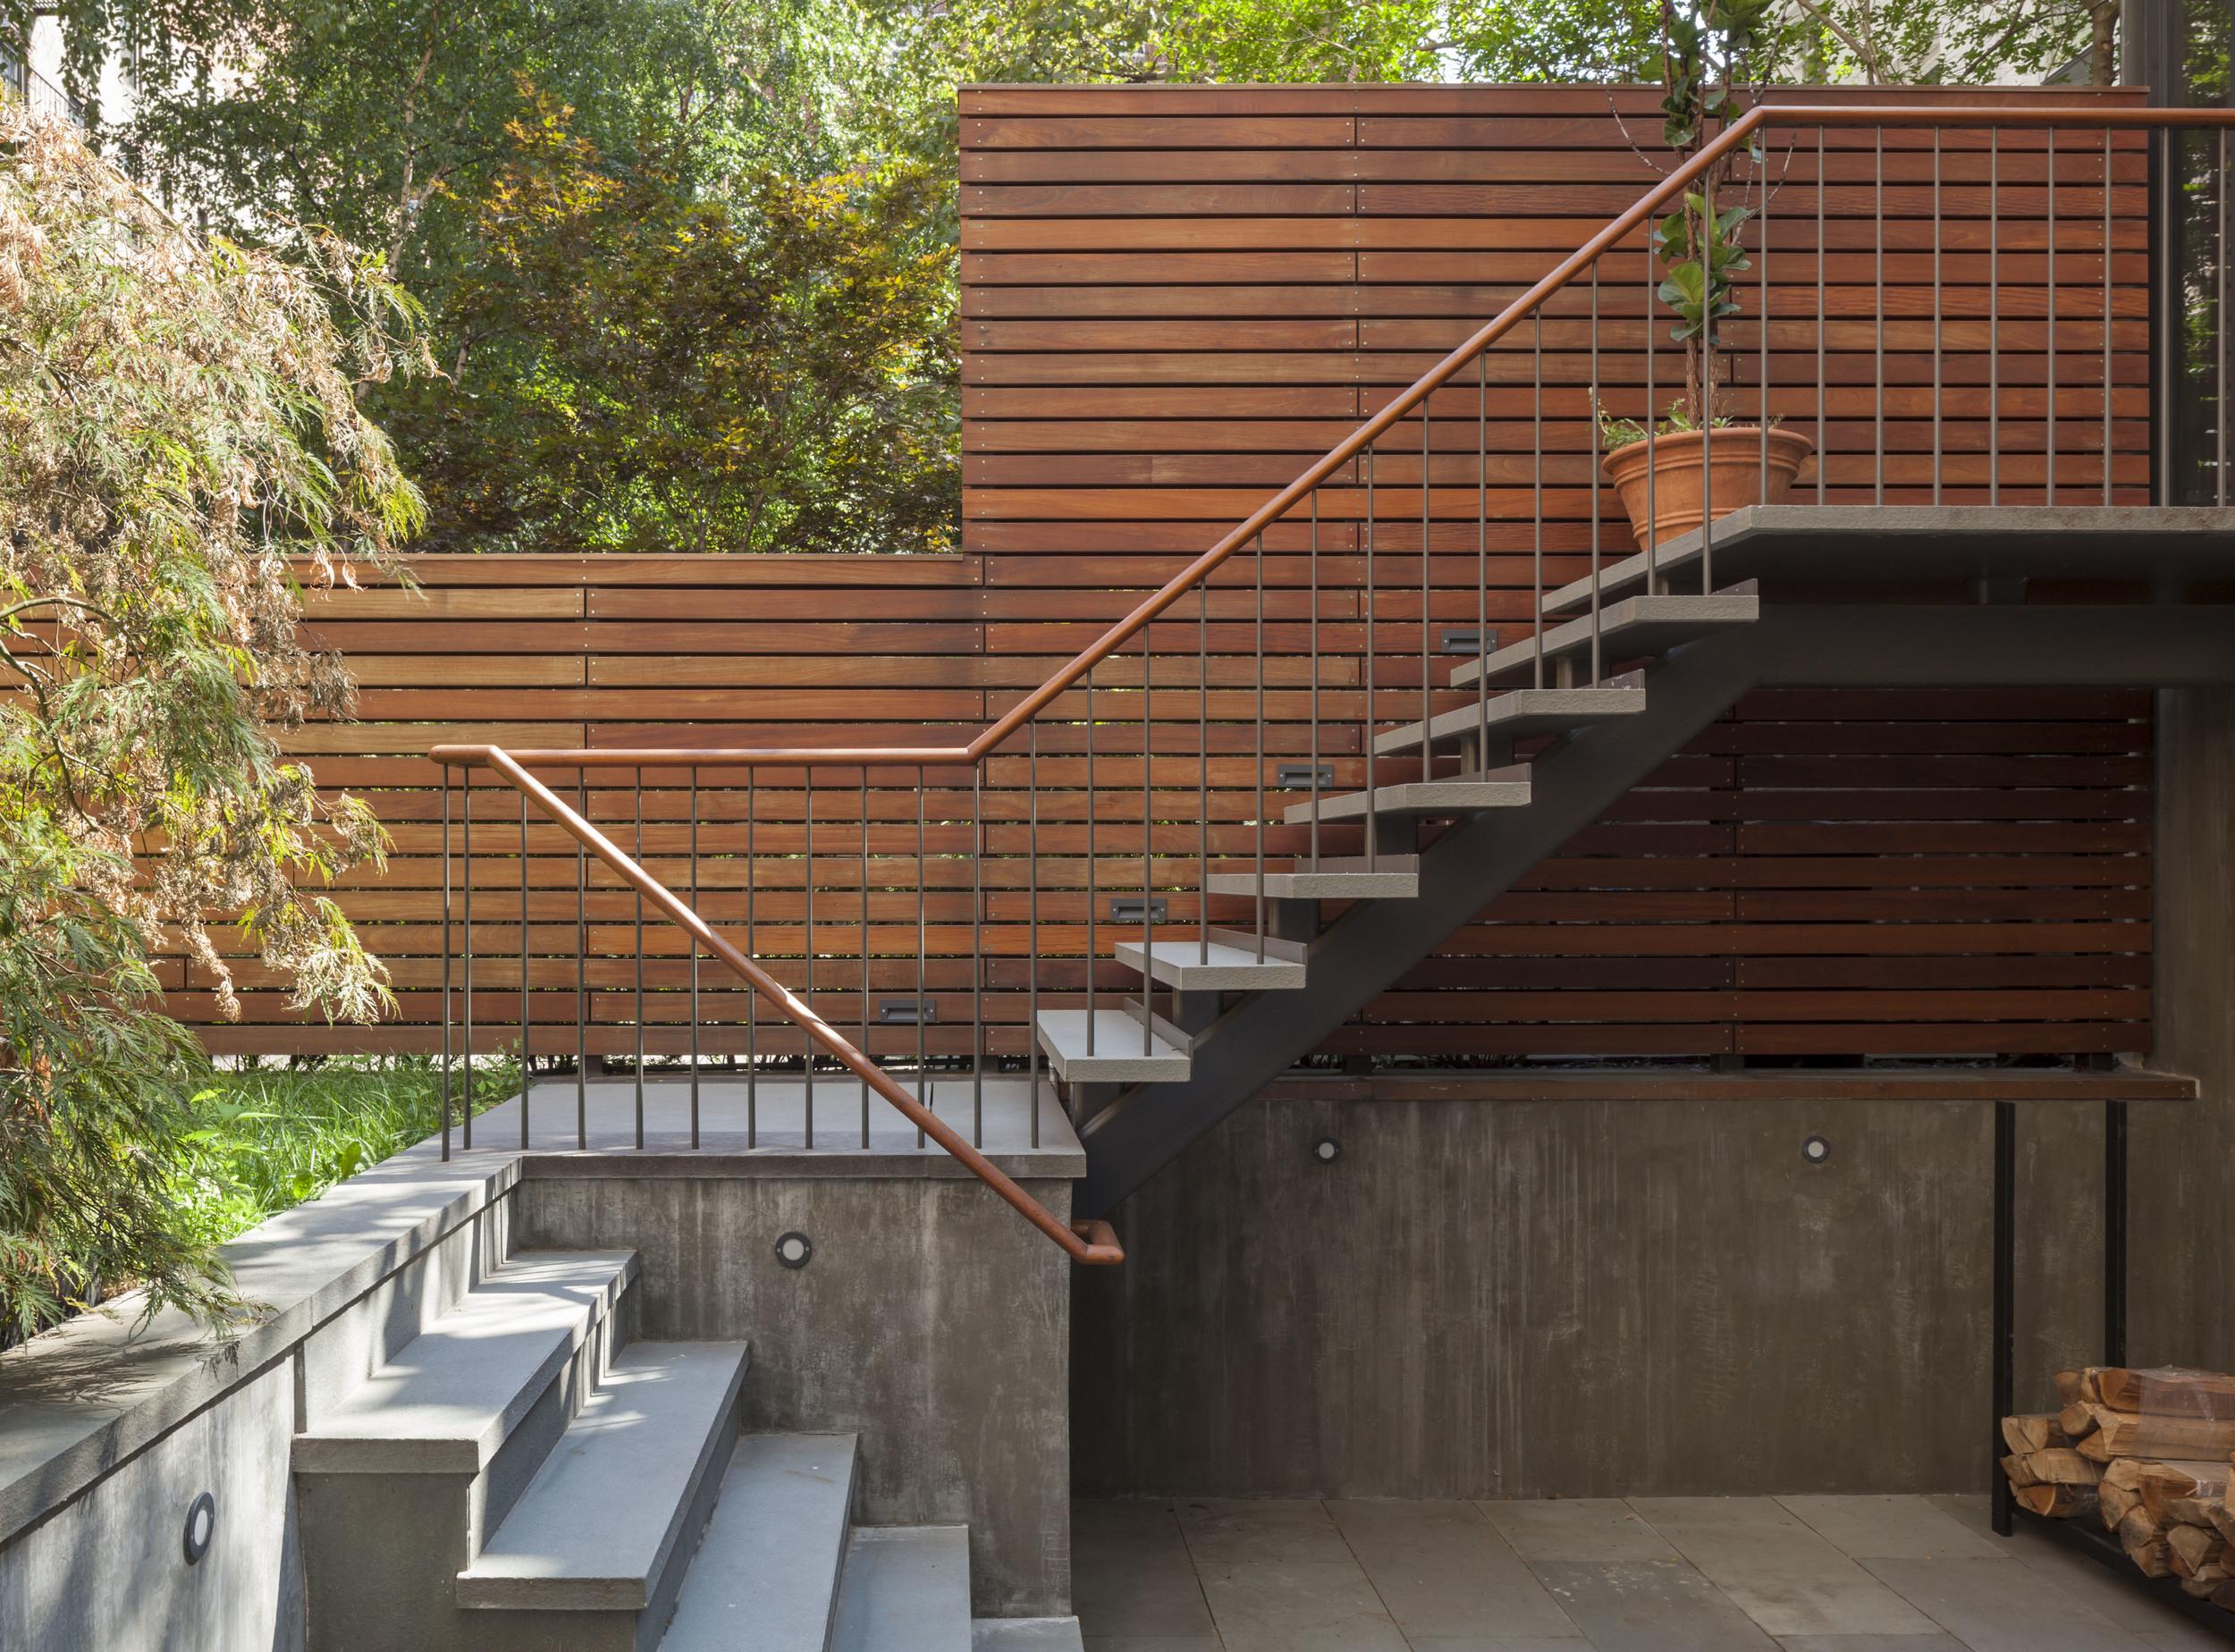 07 VAN_NY_ResidentialArchitecture.jpg